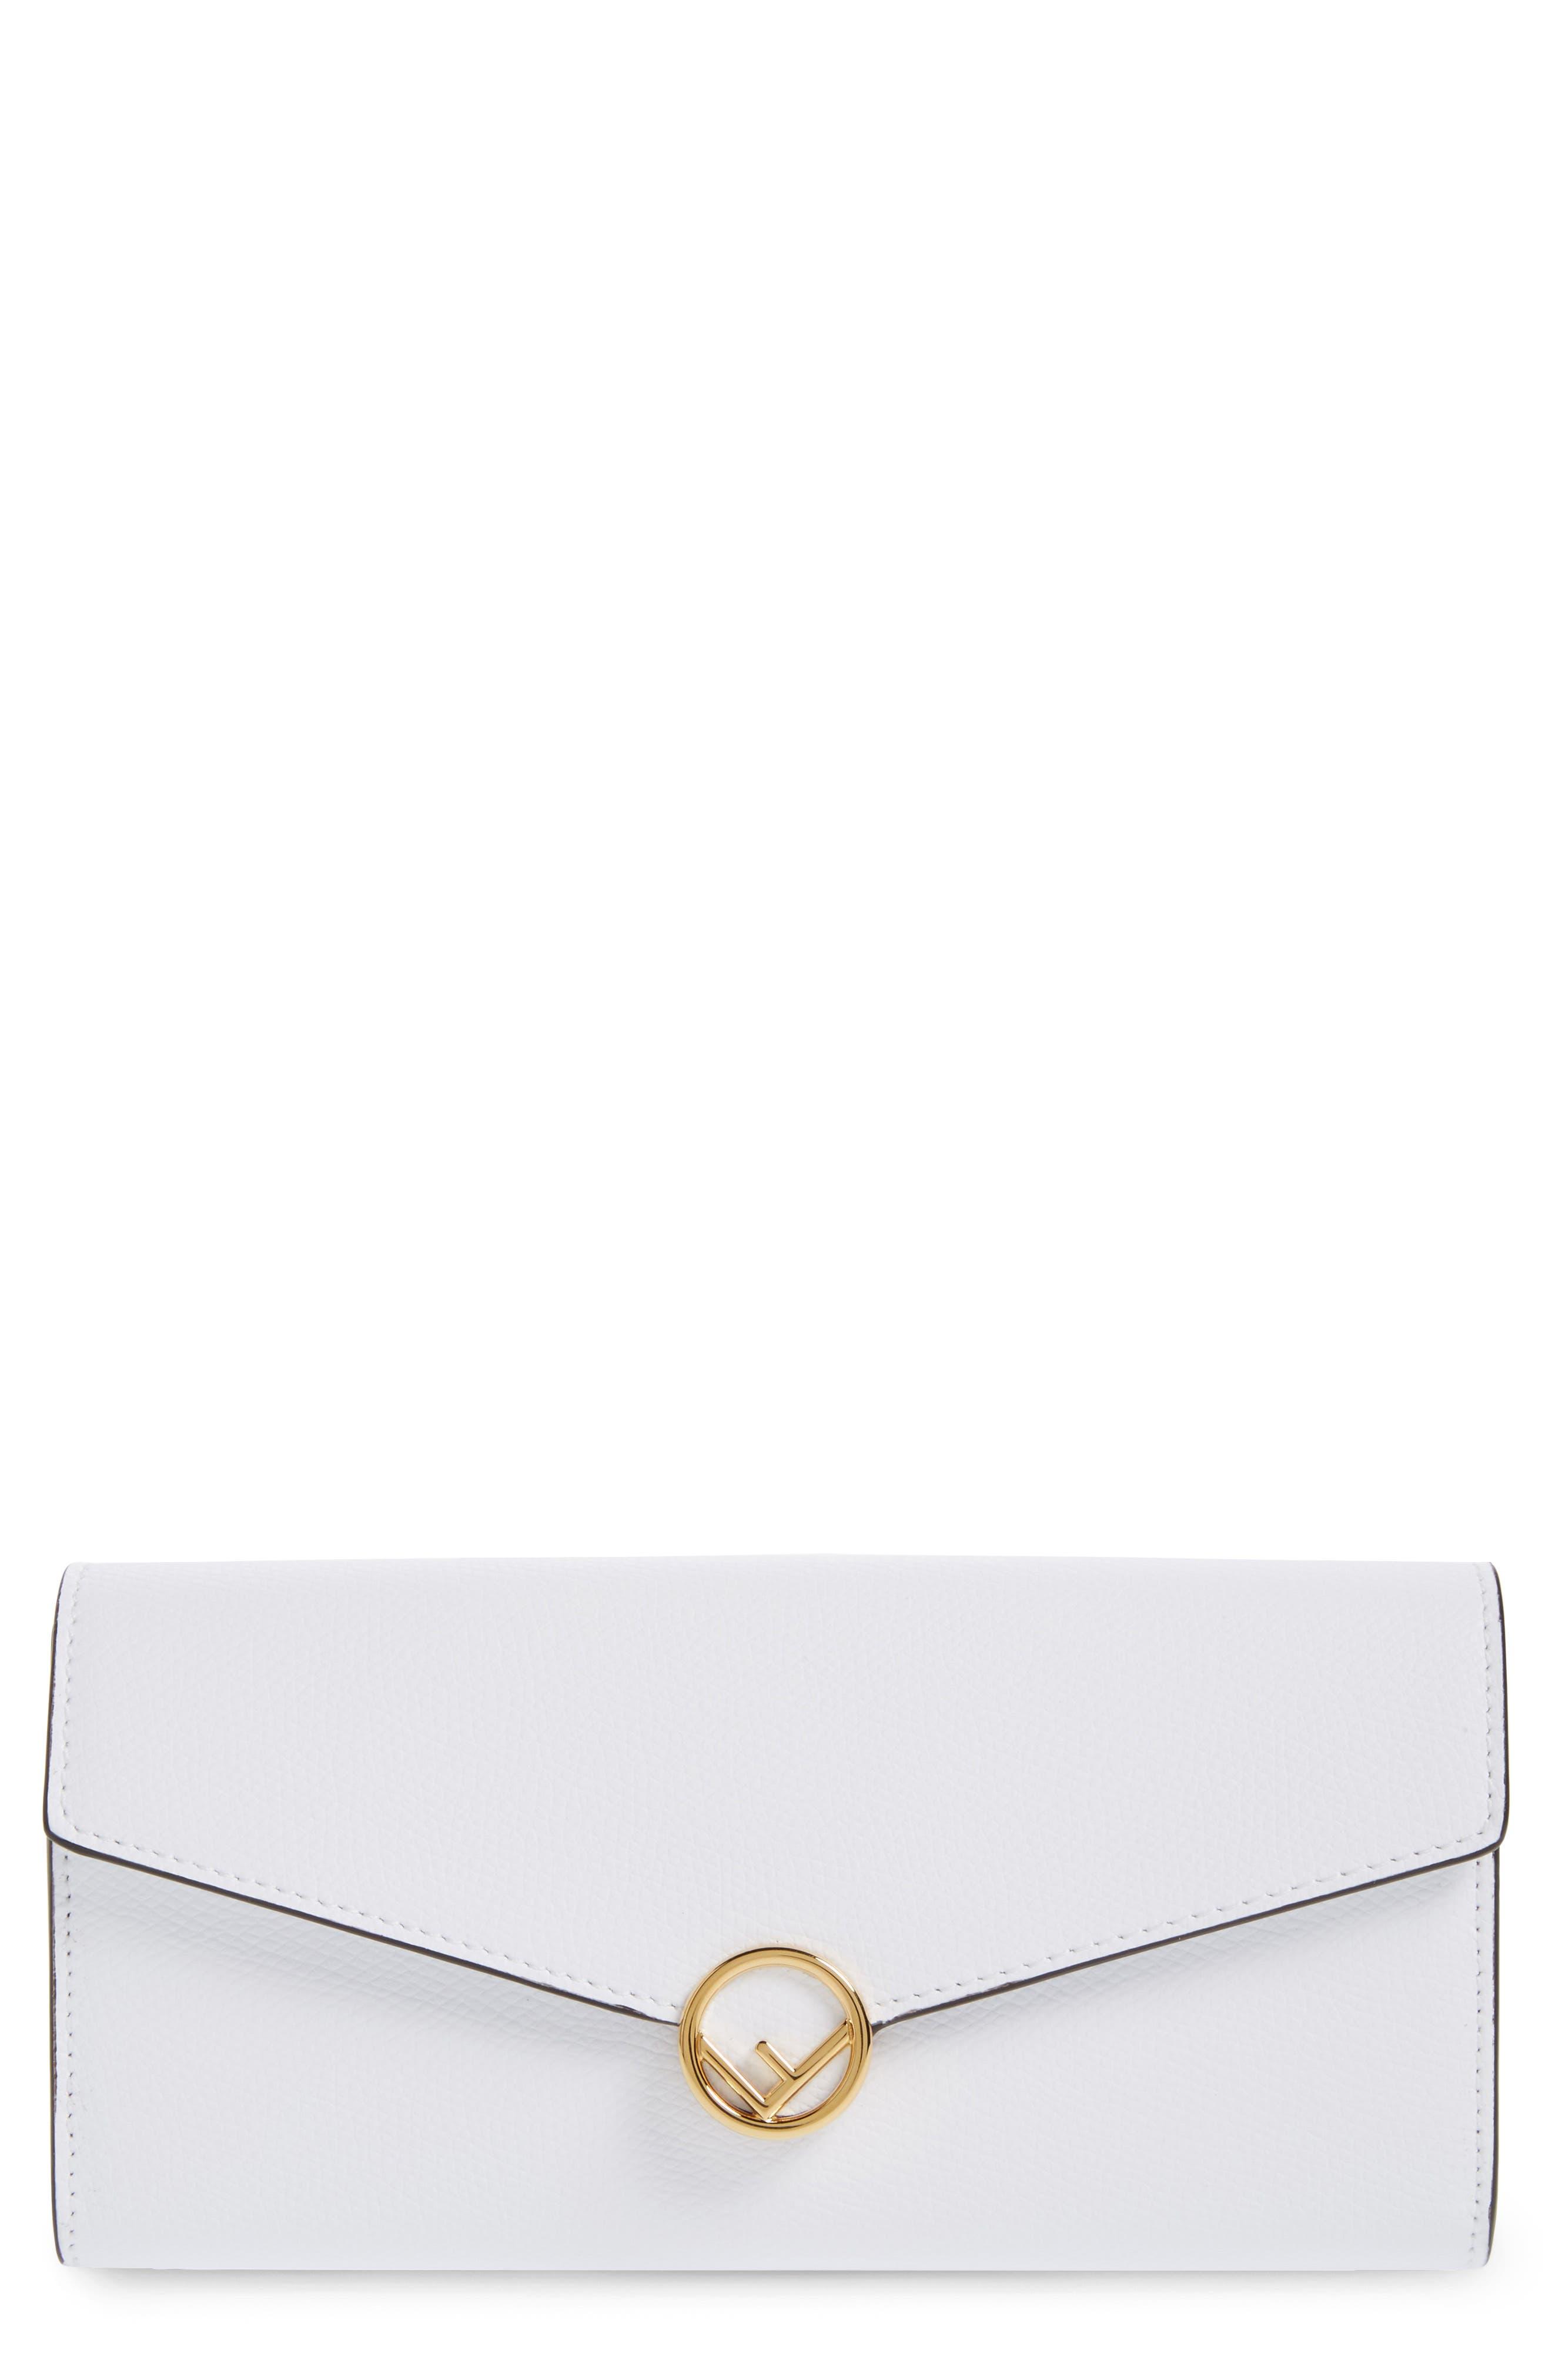 Fendi Logo Flap Leather Continental Wallet